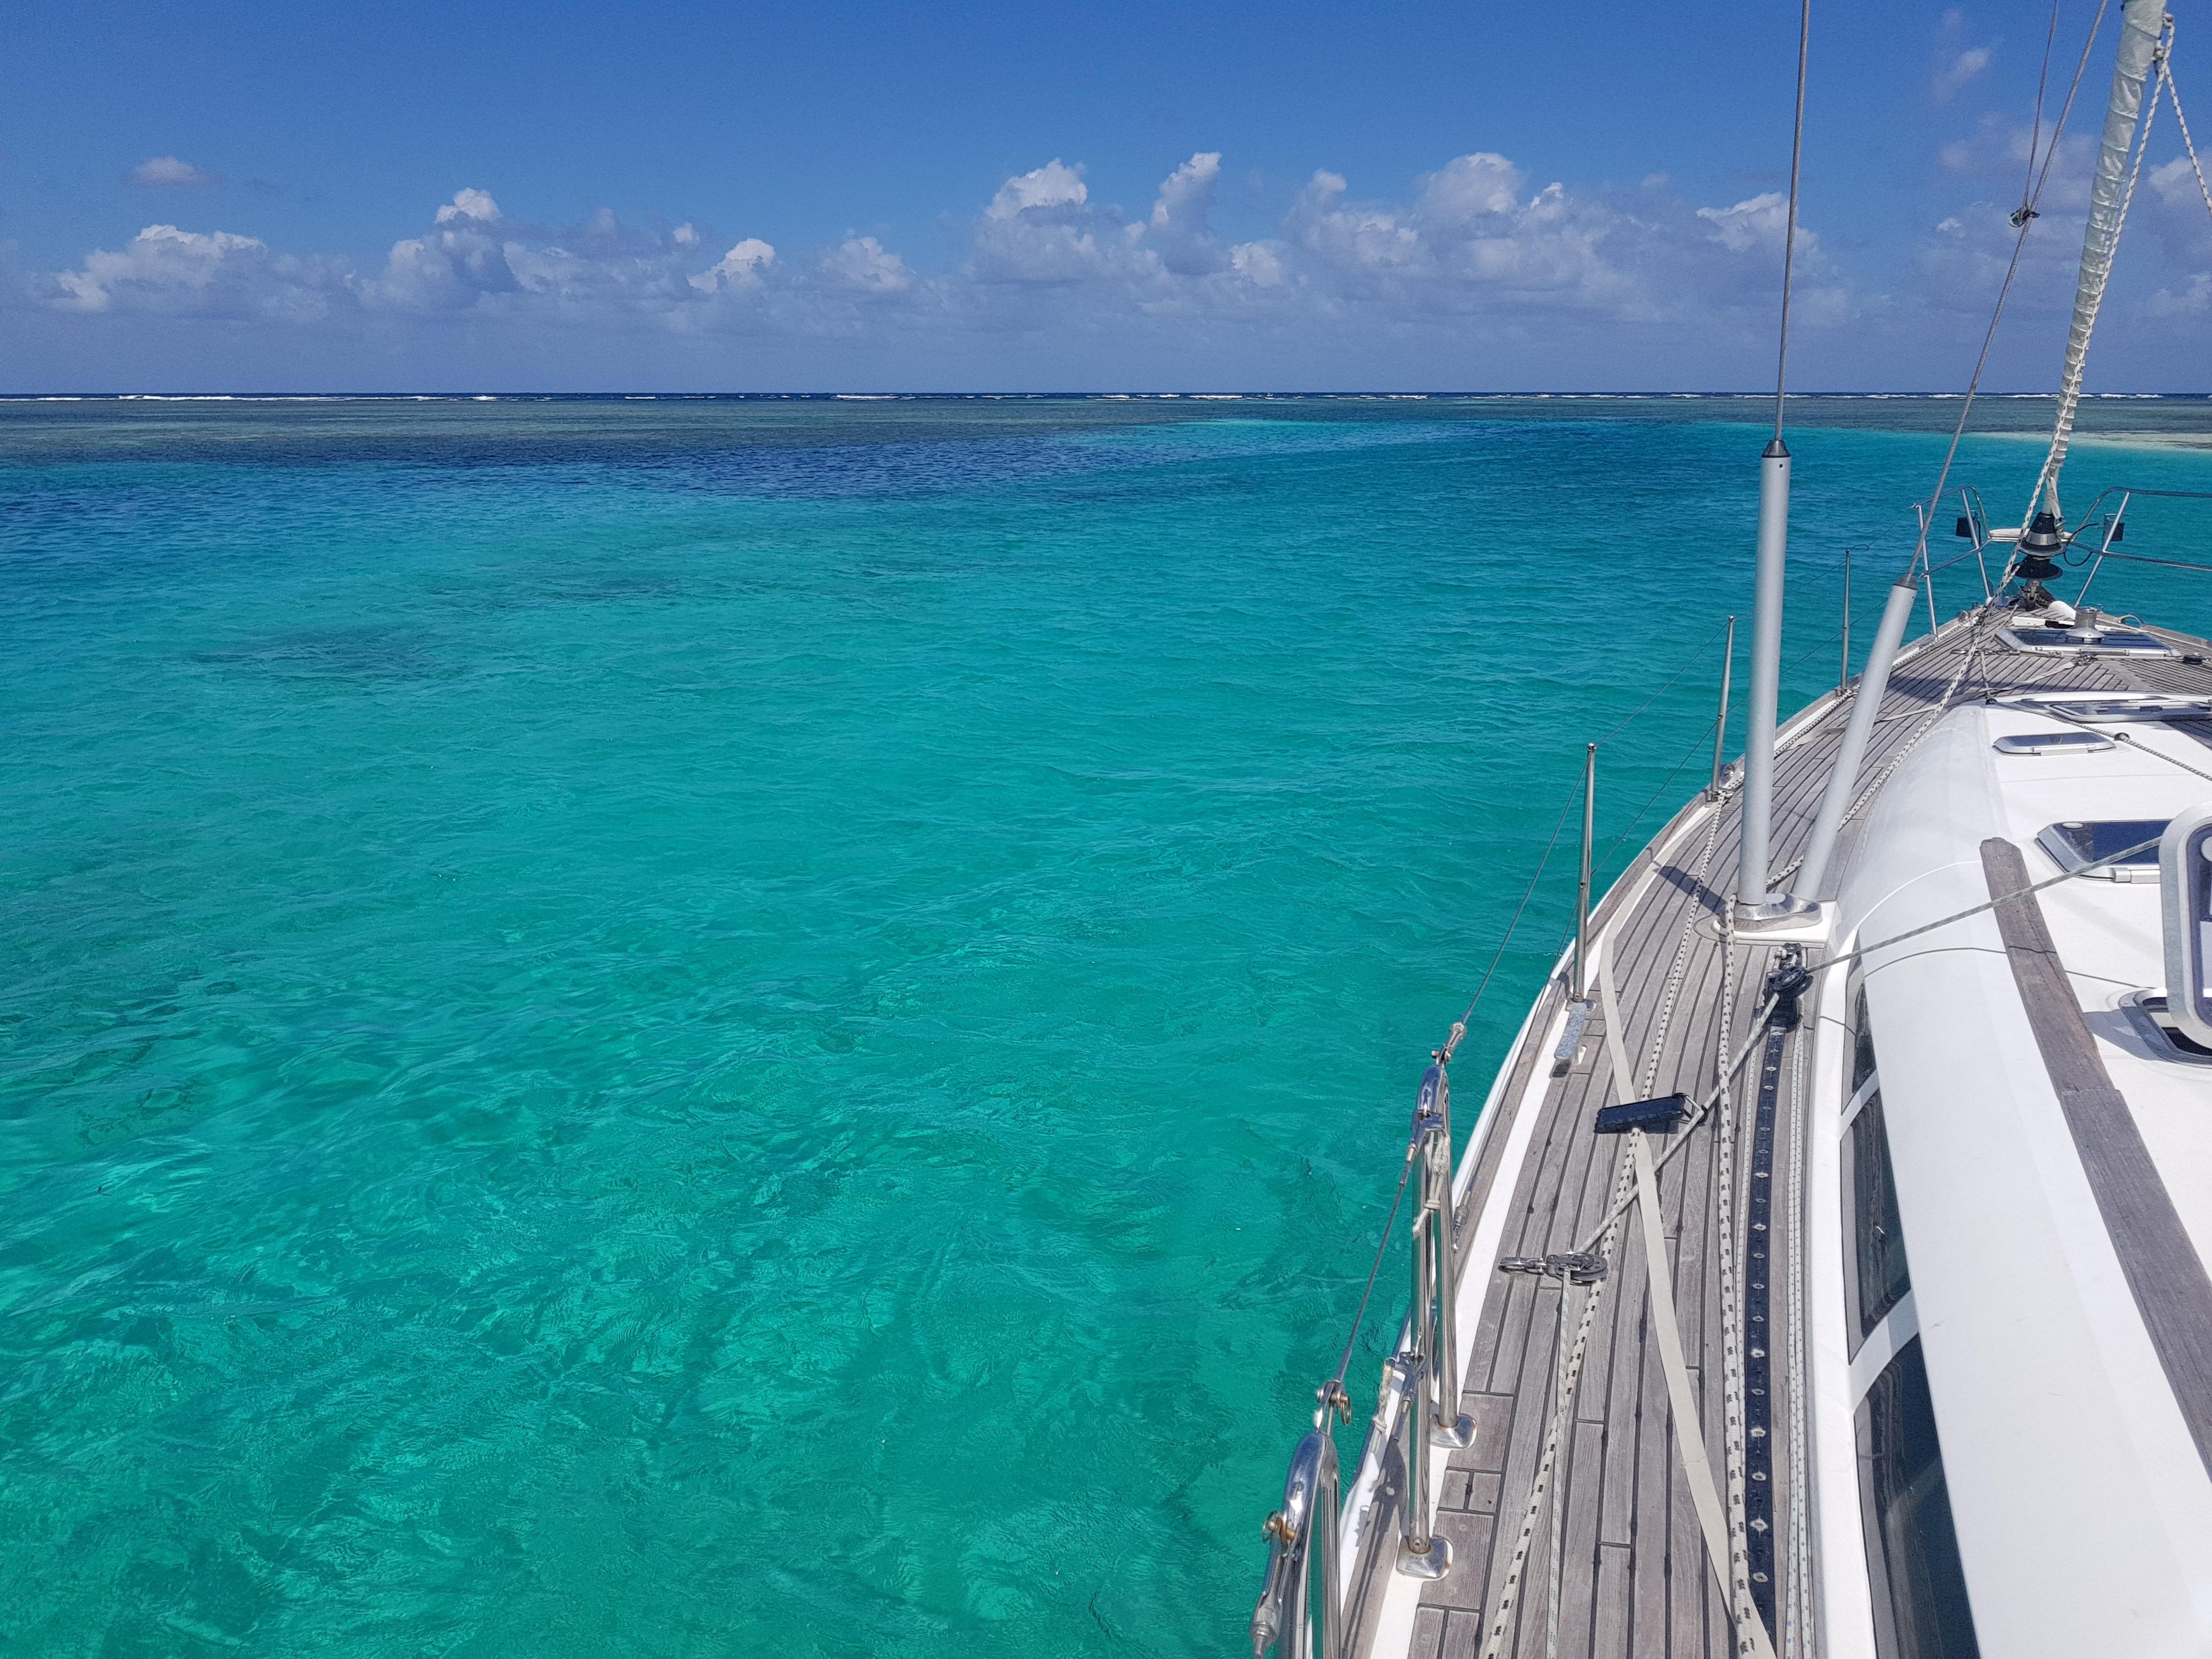 Pura Vida II Belize